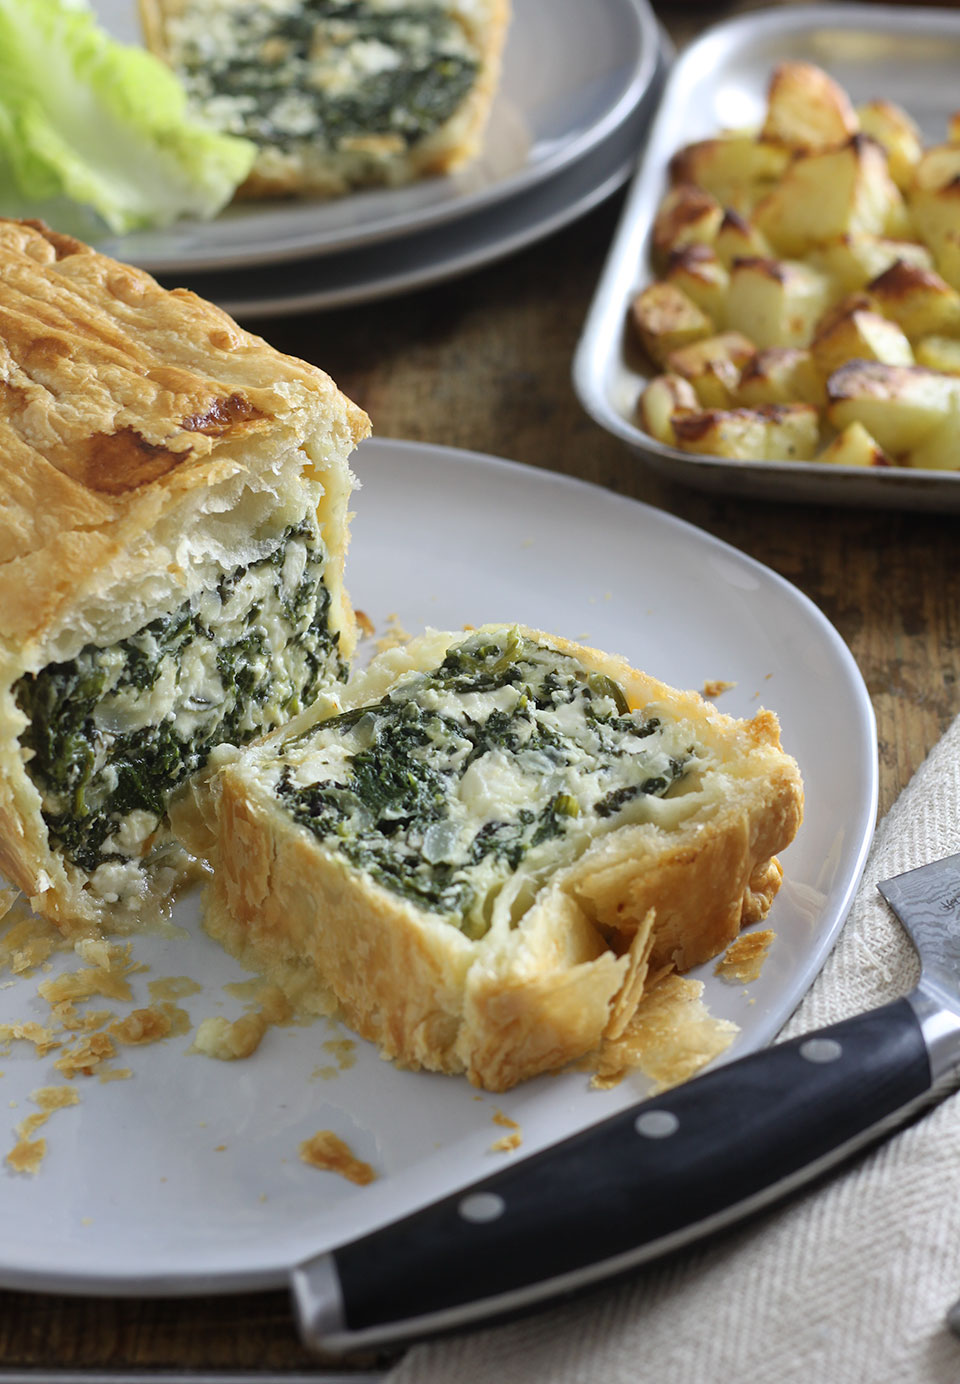 Spinach-ricotta-feta-pie-recipes-made-easy